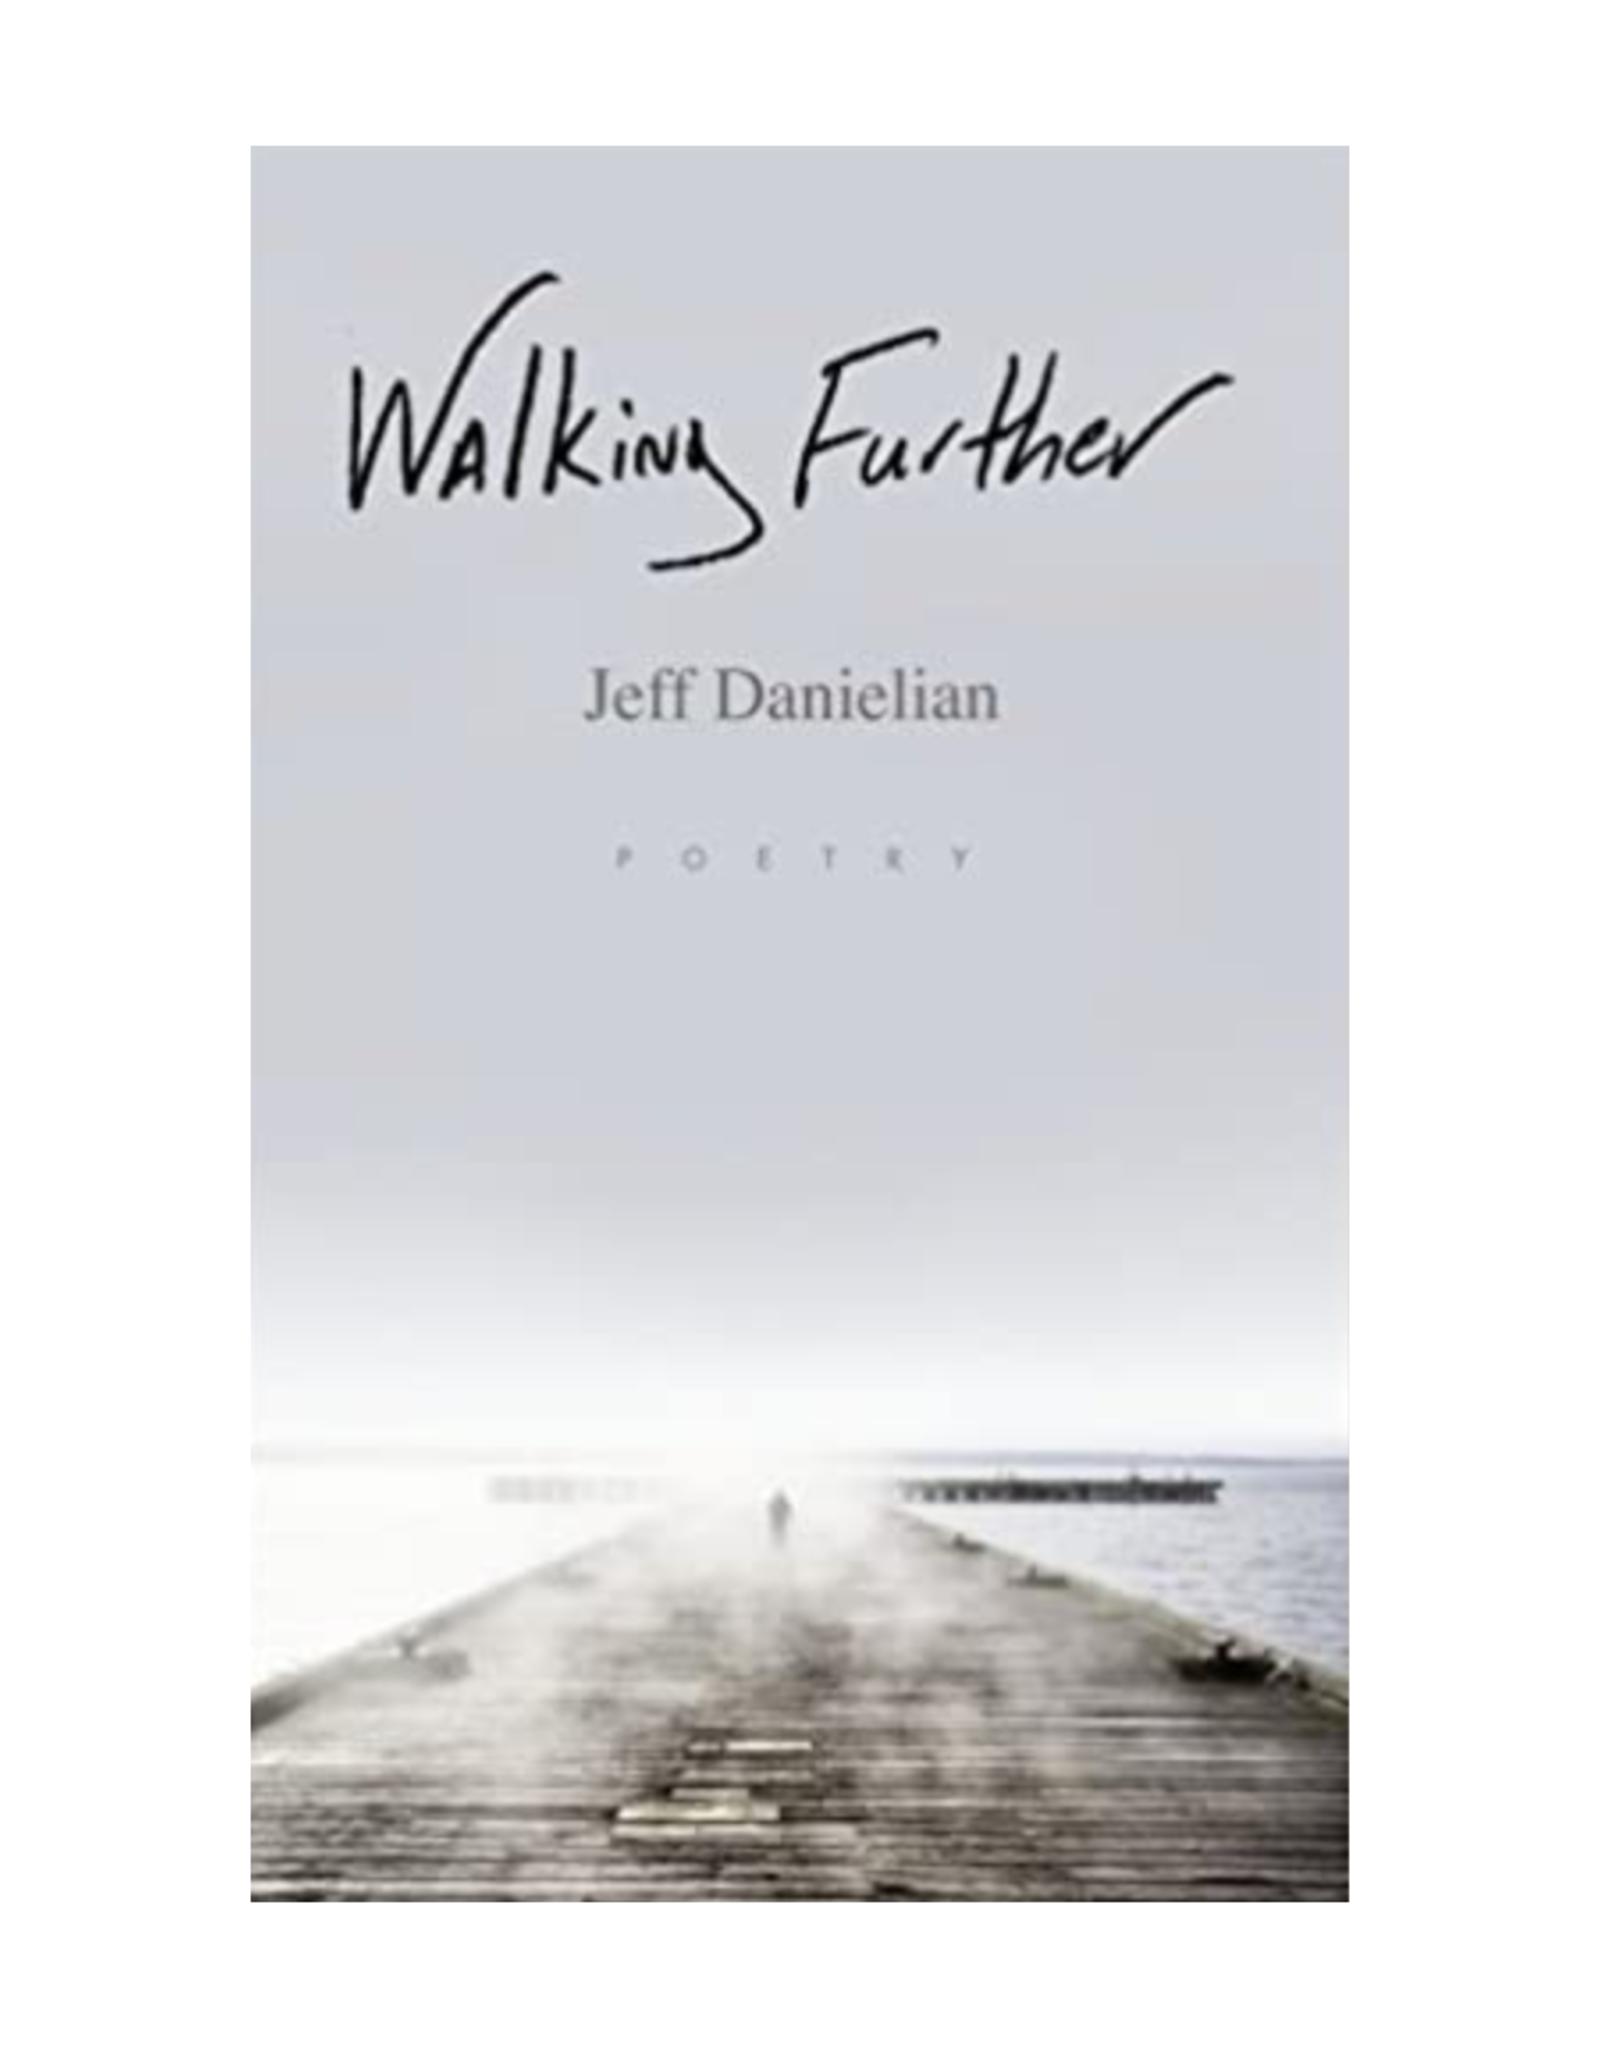 Walking Further Poetry